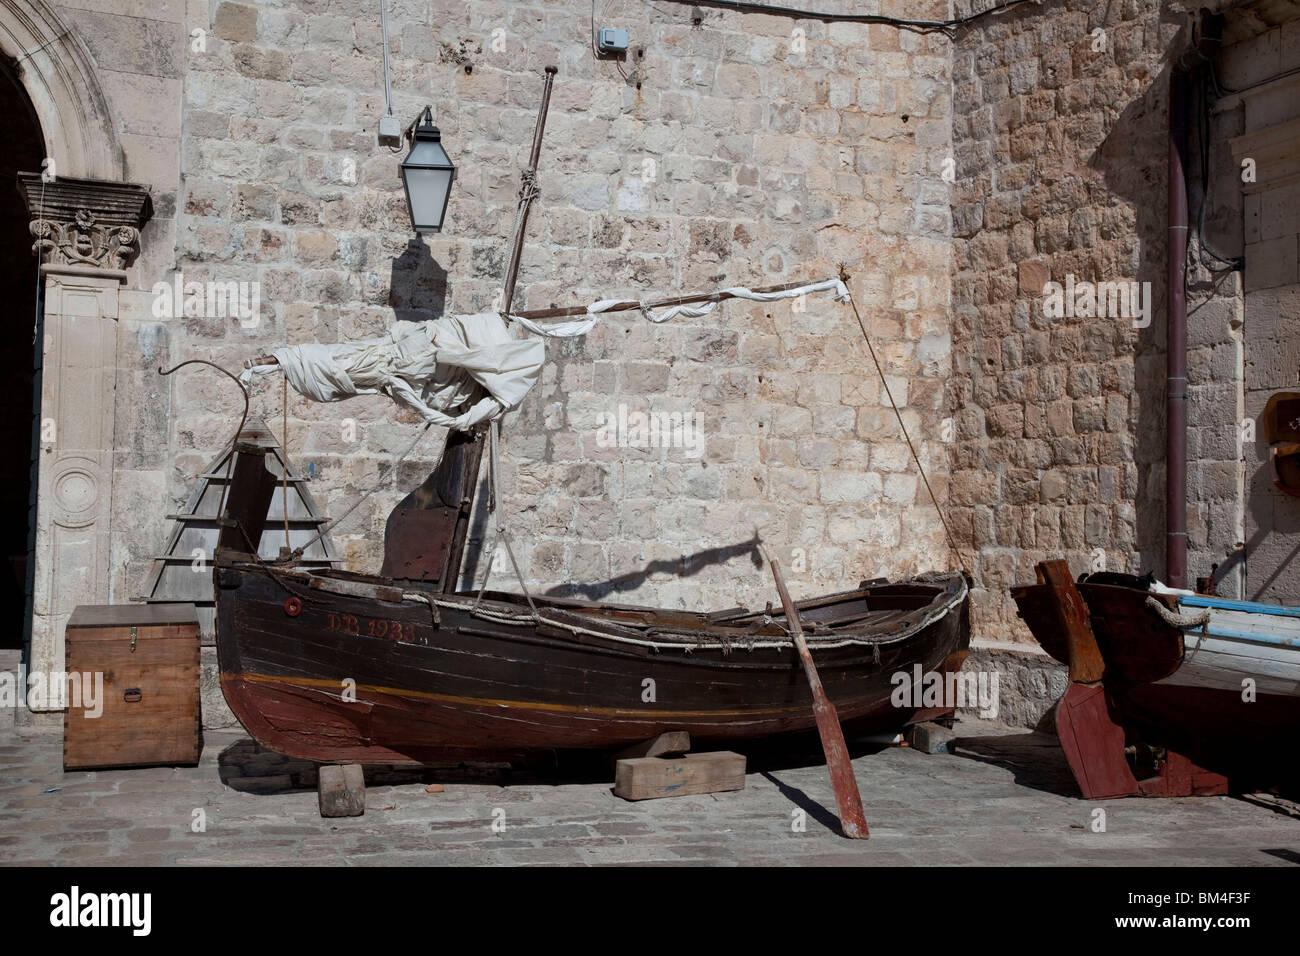 Old boat, harbourside, Dubrovnik, Croatia - Stock Image